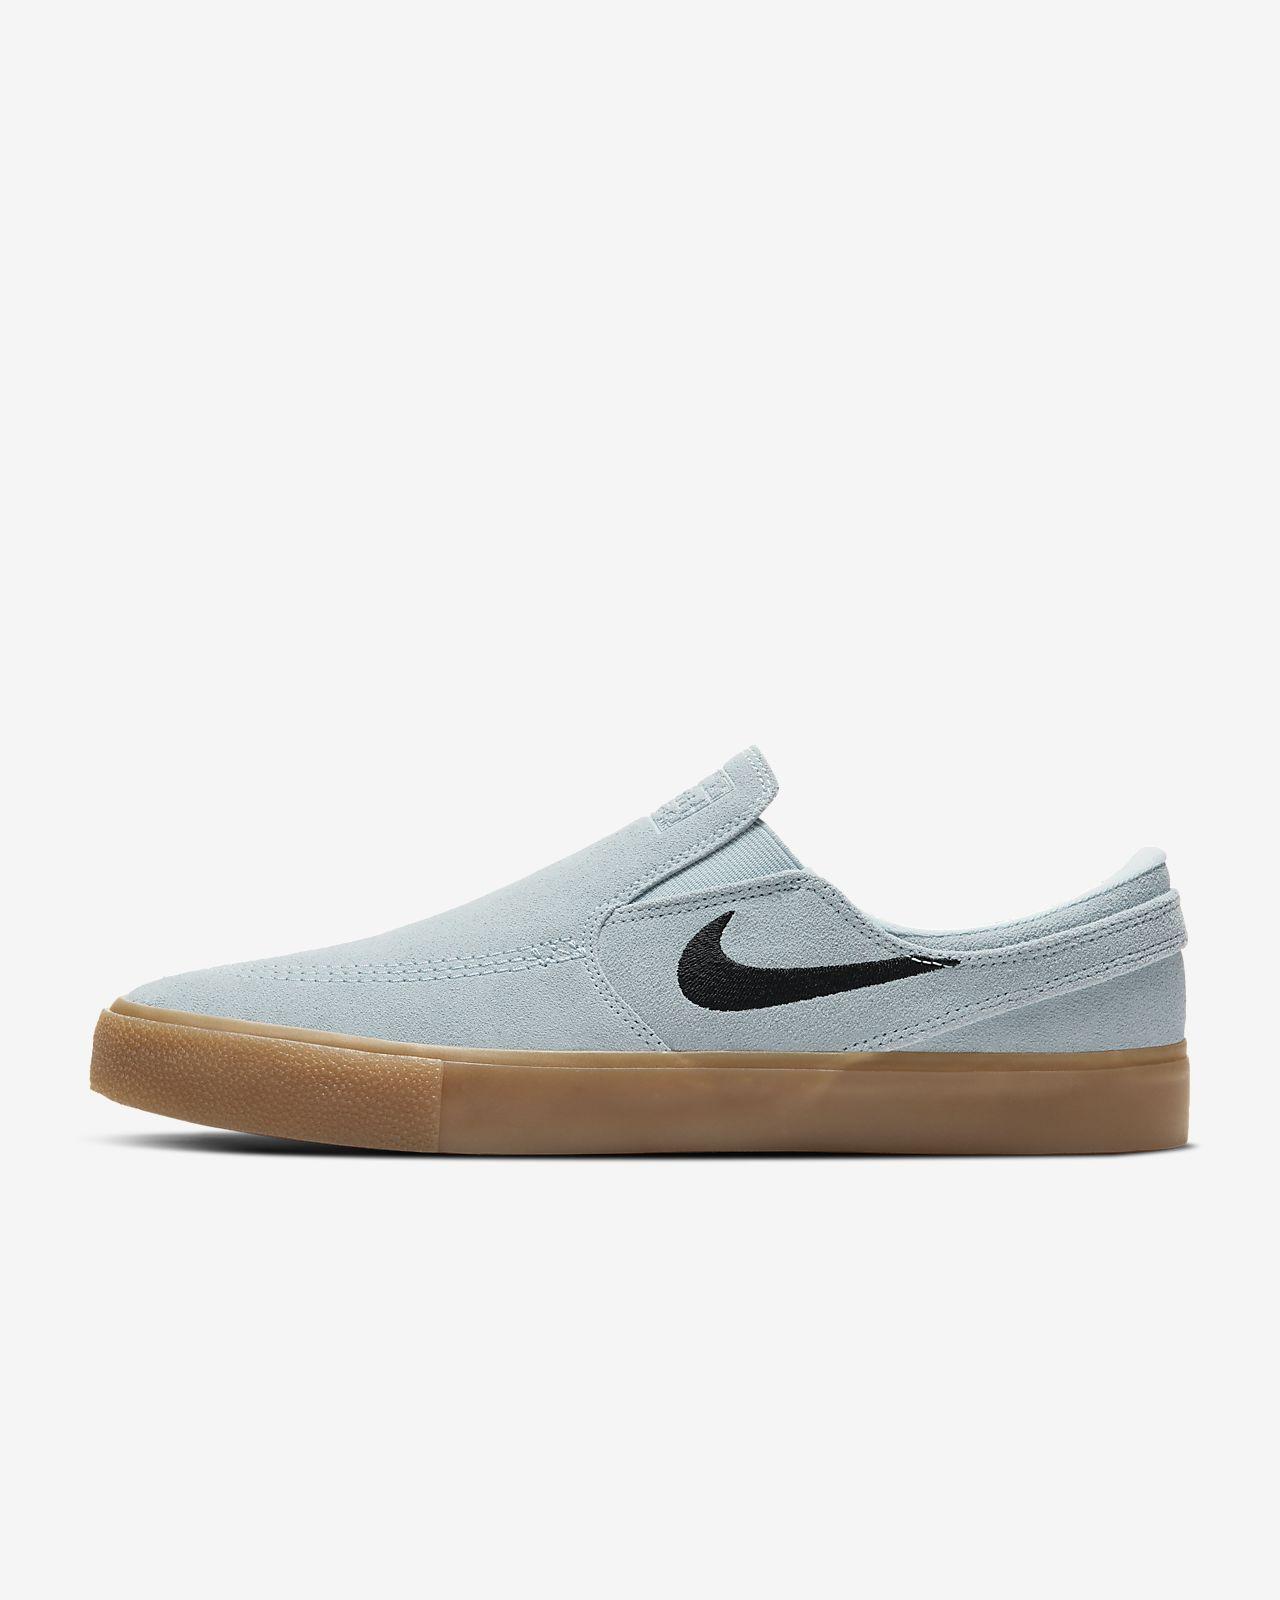 Nike SB Zoom Stefan Janoski Slip RM Skateboardschuh